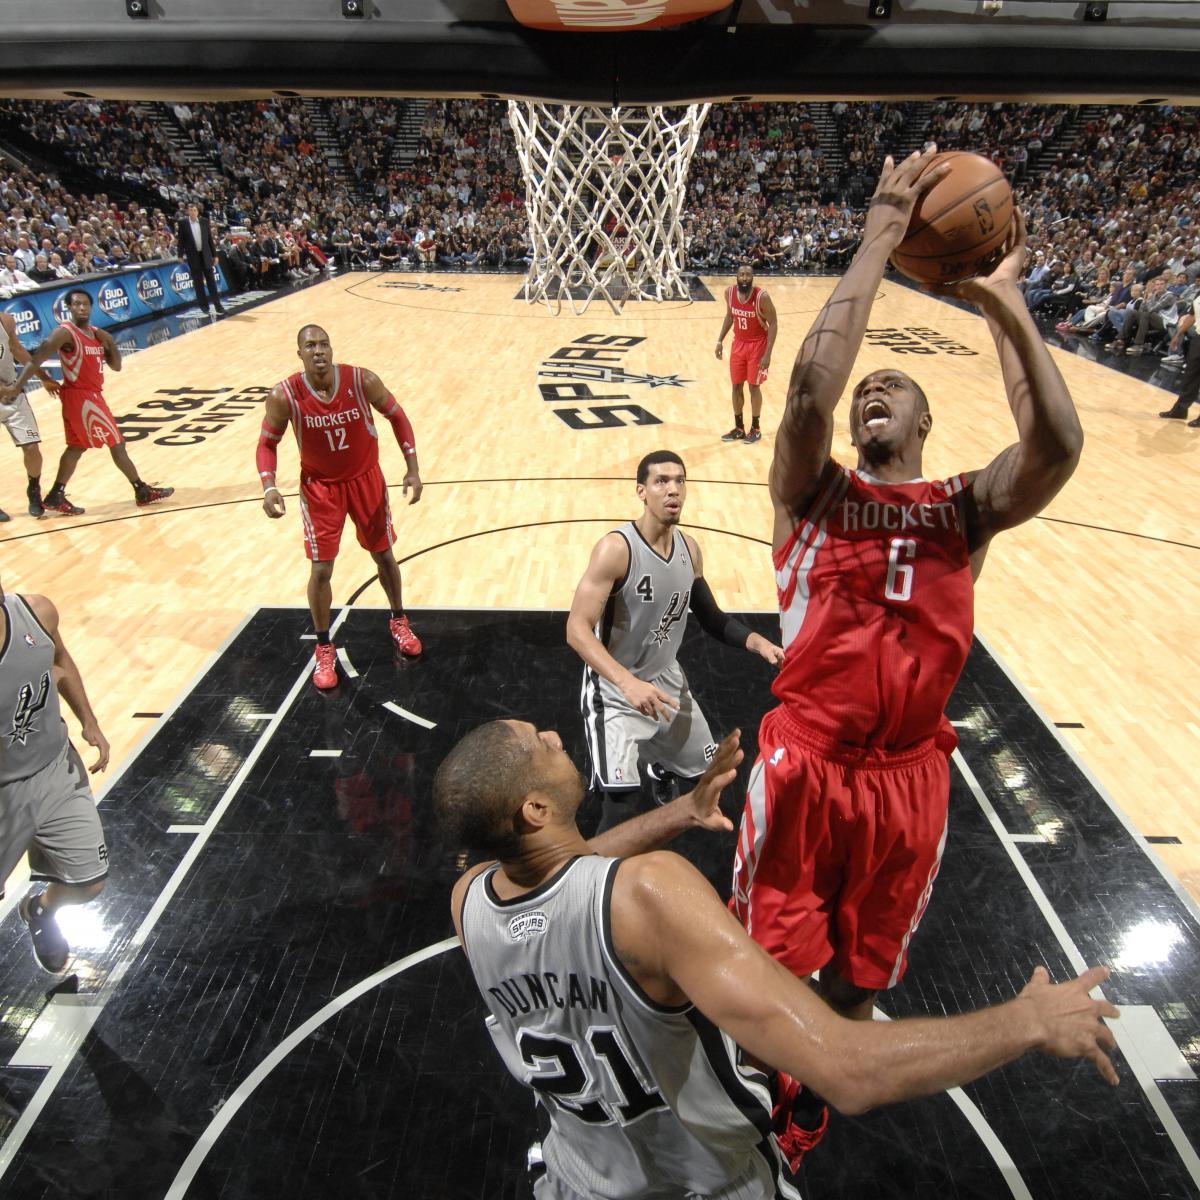 Houston Rockets Win Last Night: 6 Takeaways From Saturday's NBA Action